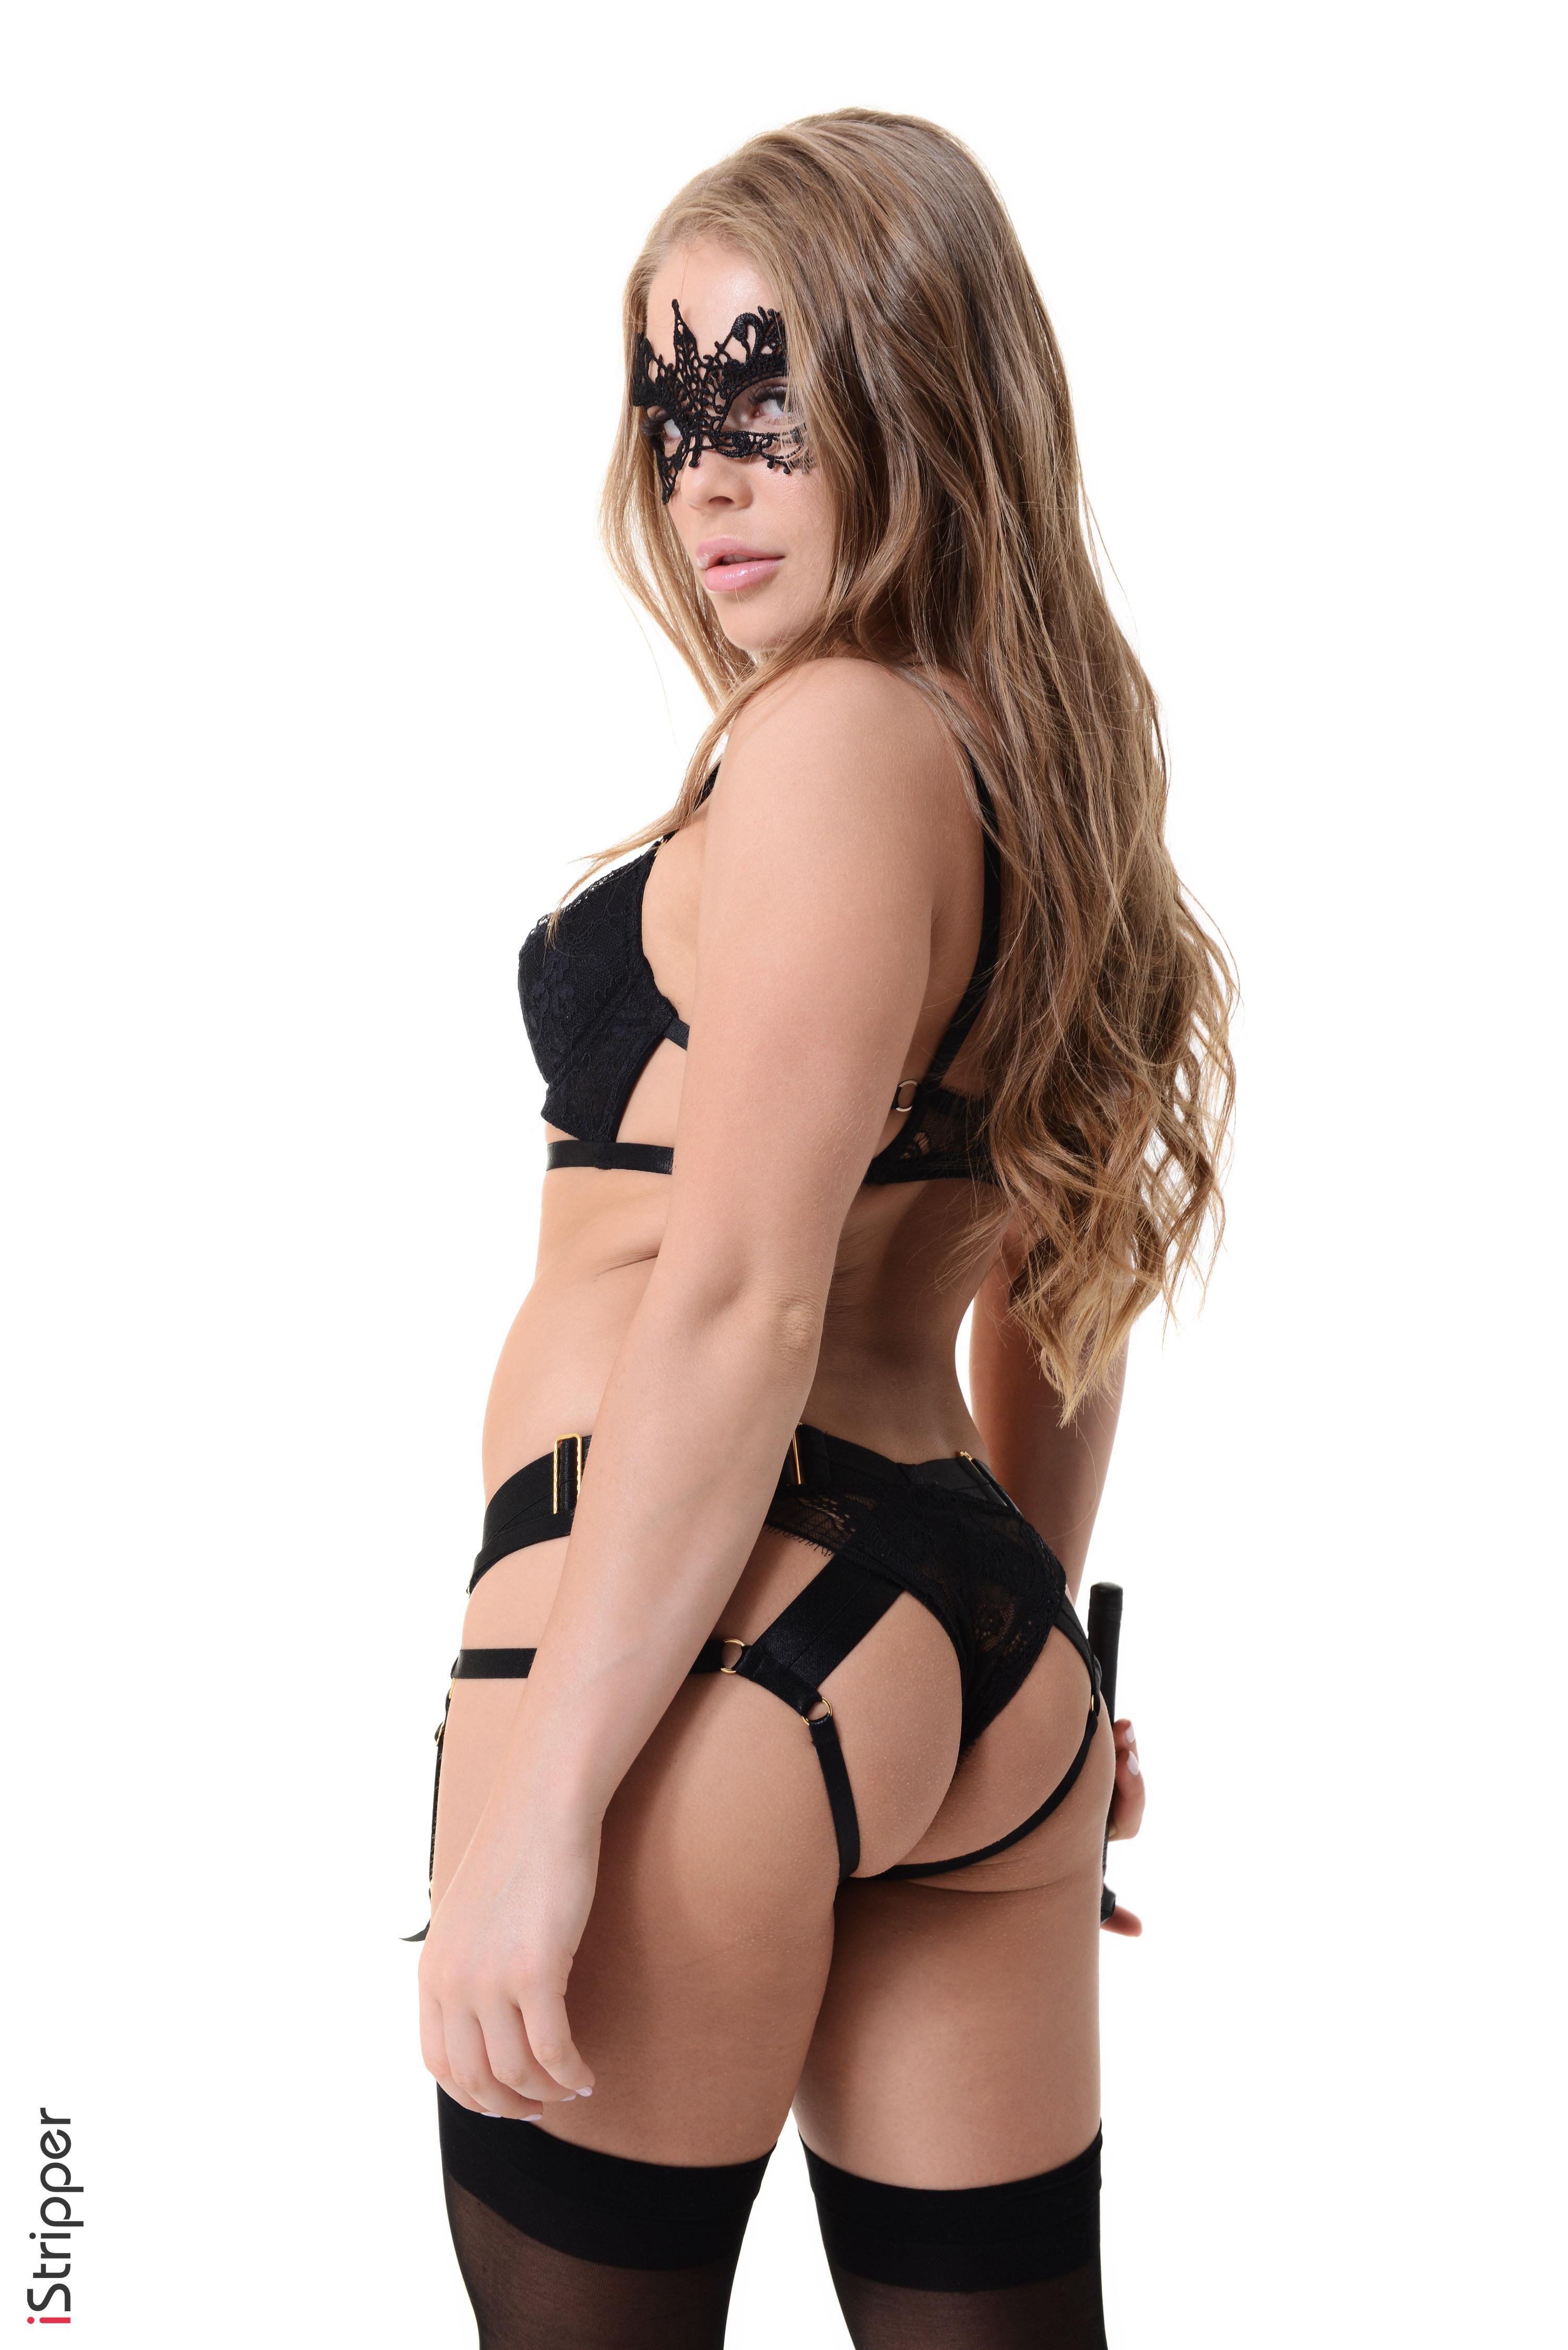 free desktop stripper girls